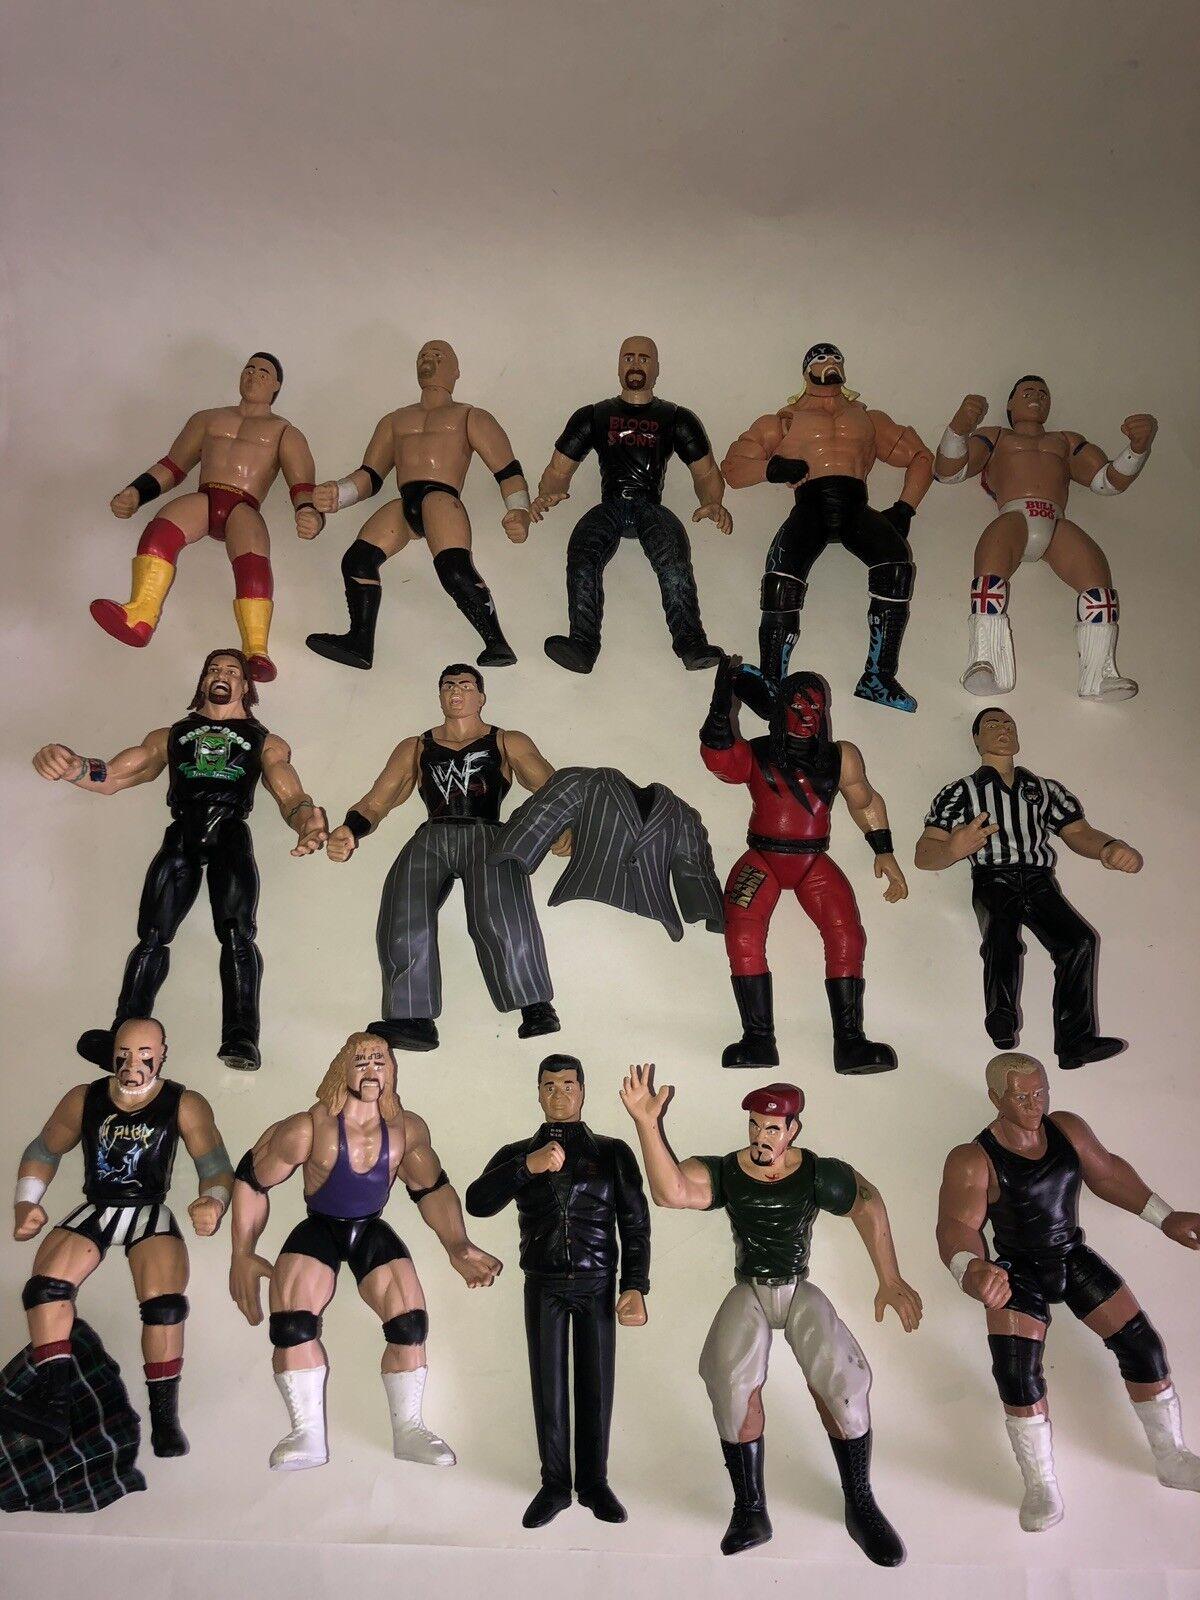 WWE WCW WWF Wrestling Figures Lot of 15 96'-99' Hulk Hogan Vince McMahon Kane+